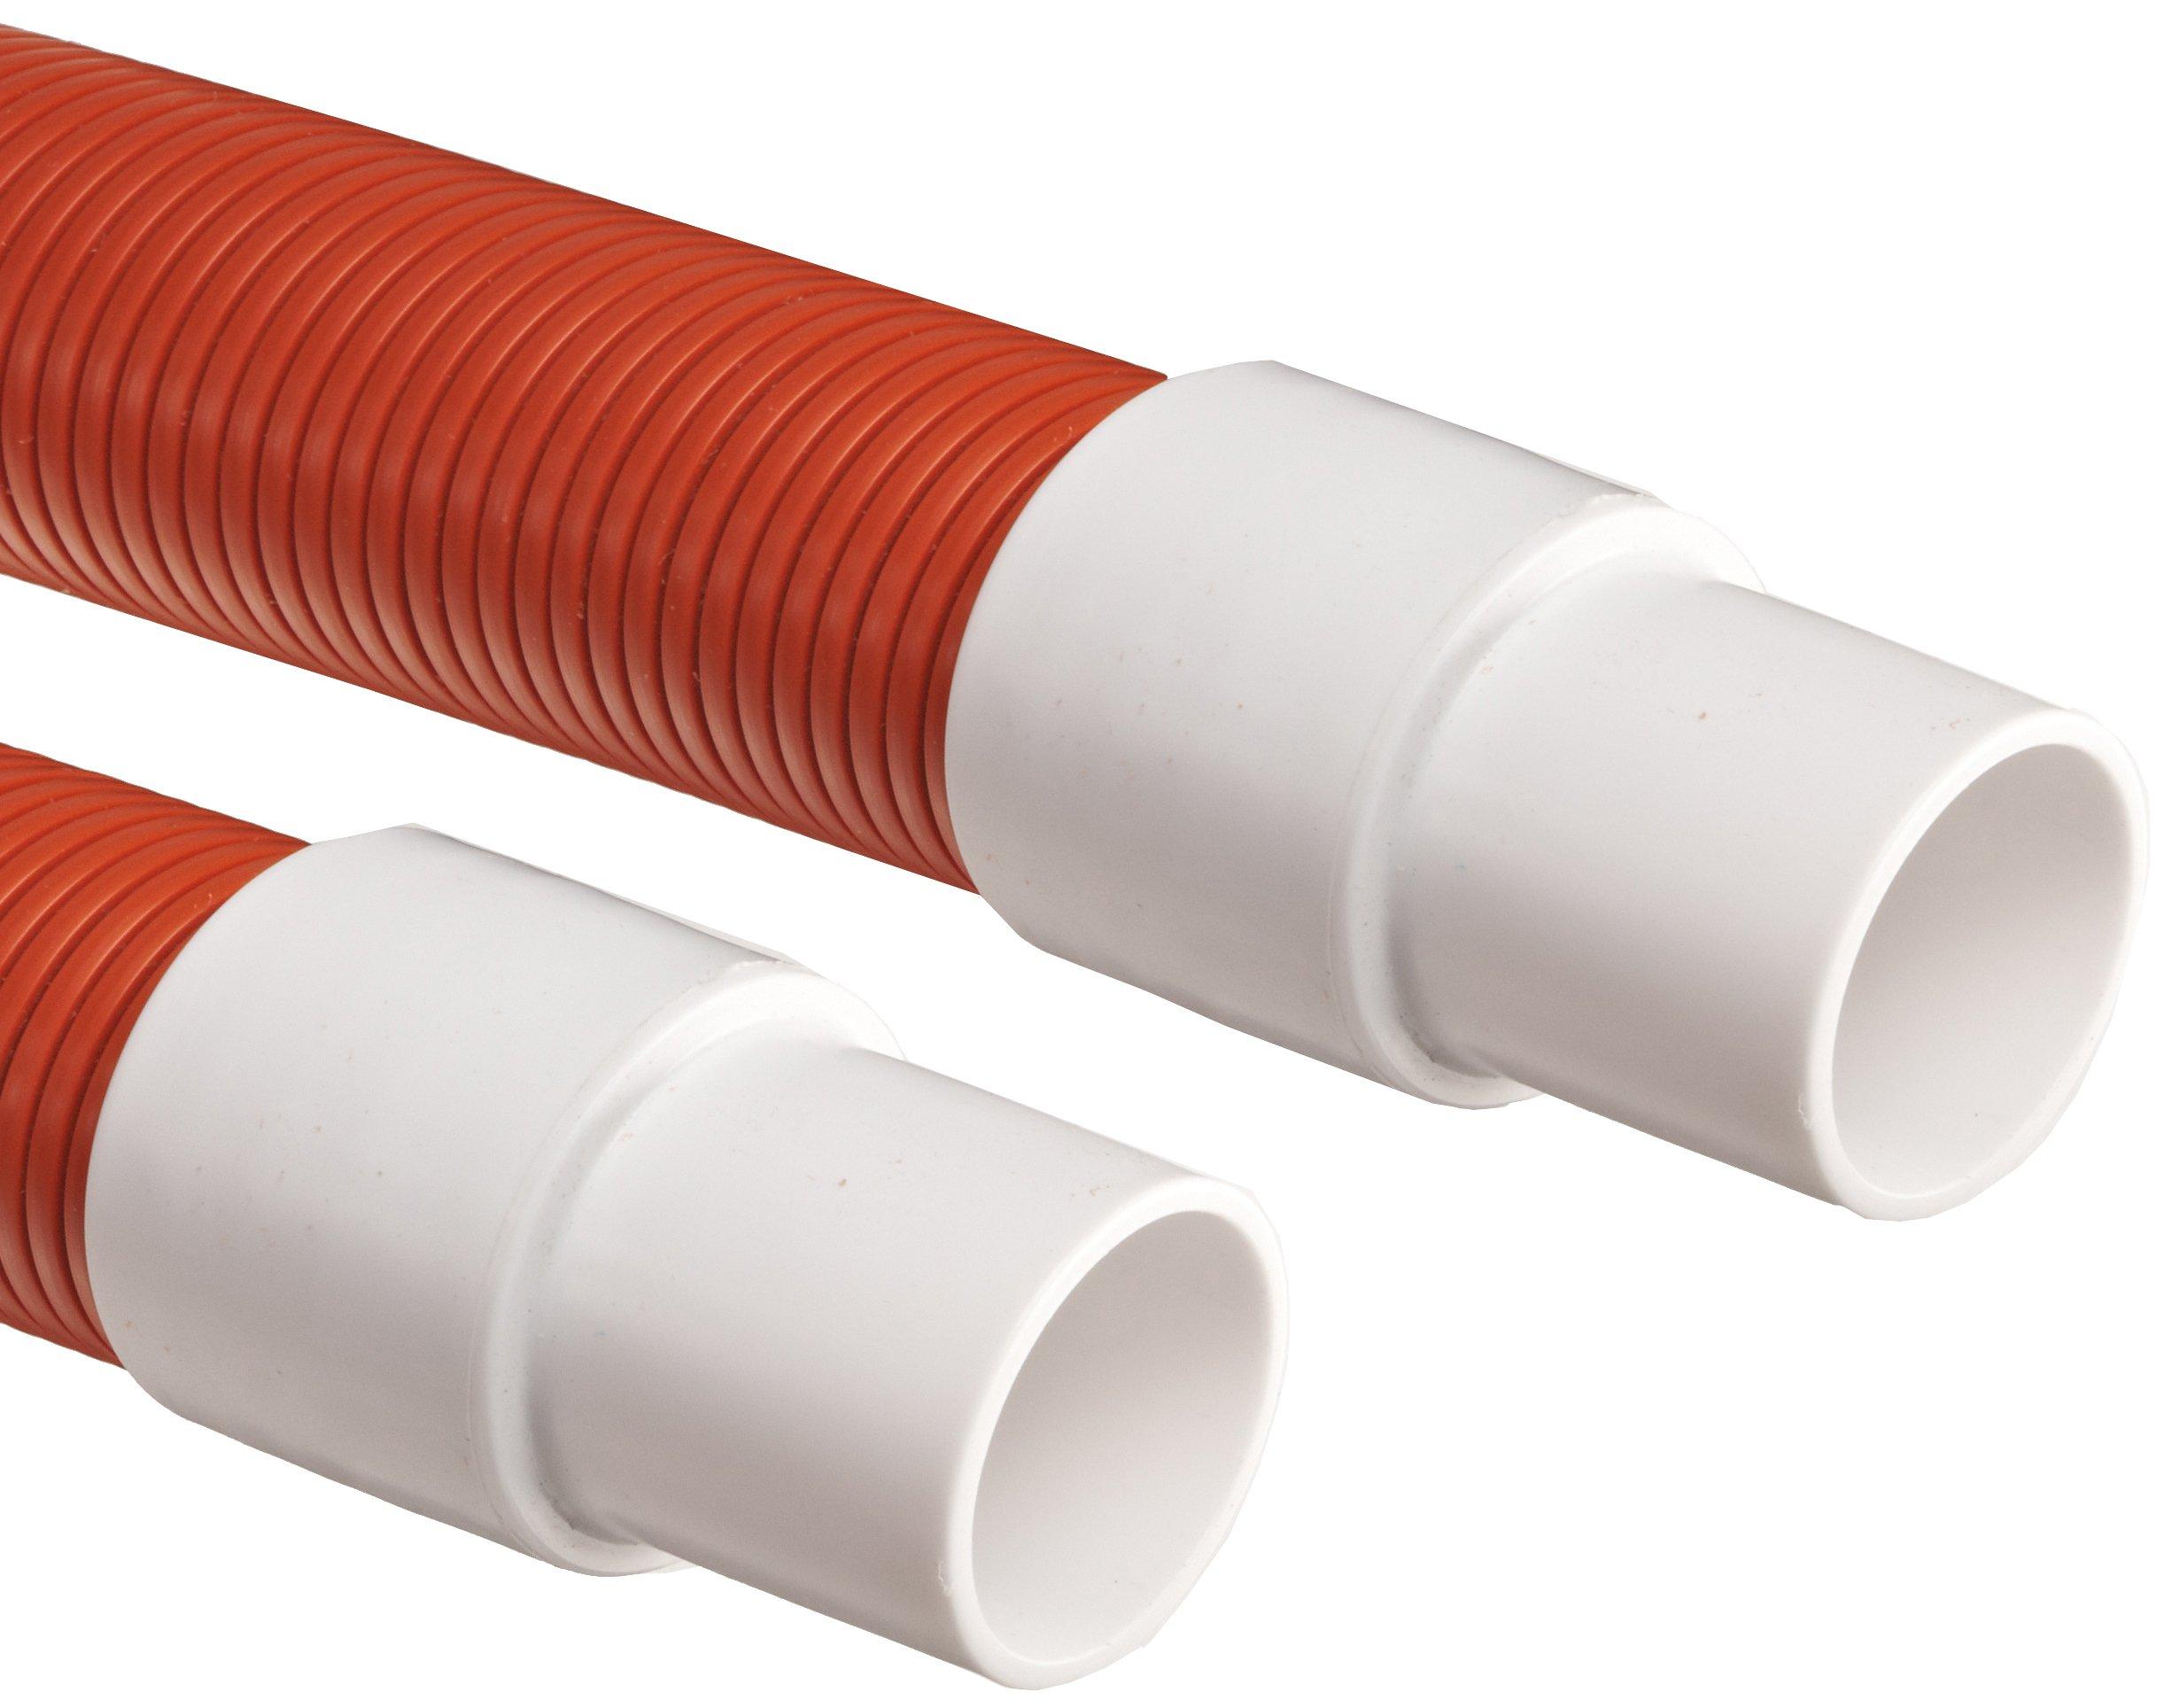 Genesis STM Polyethylene Duct Hose, Orange, 1.5'' ID, 50' Length